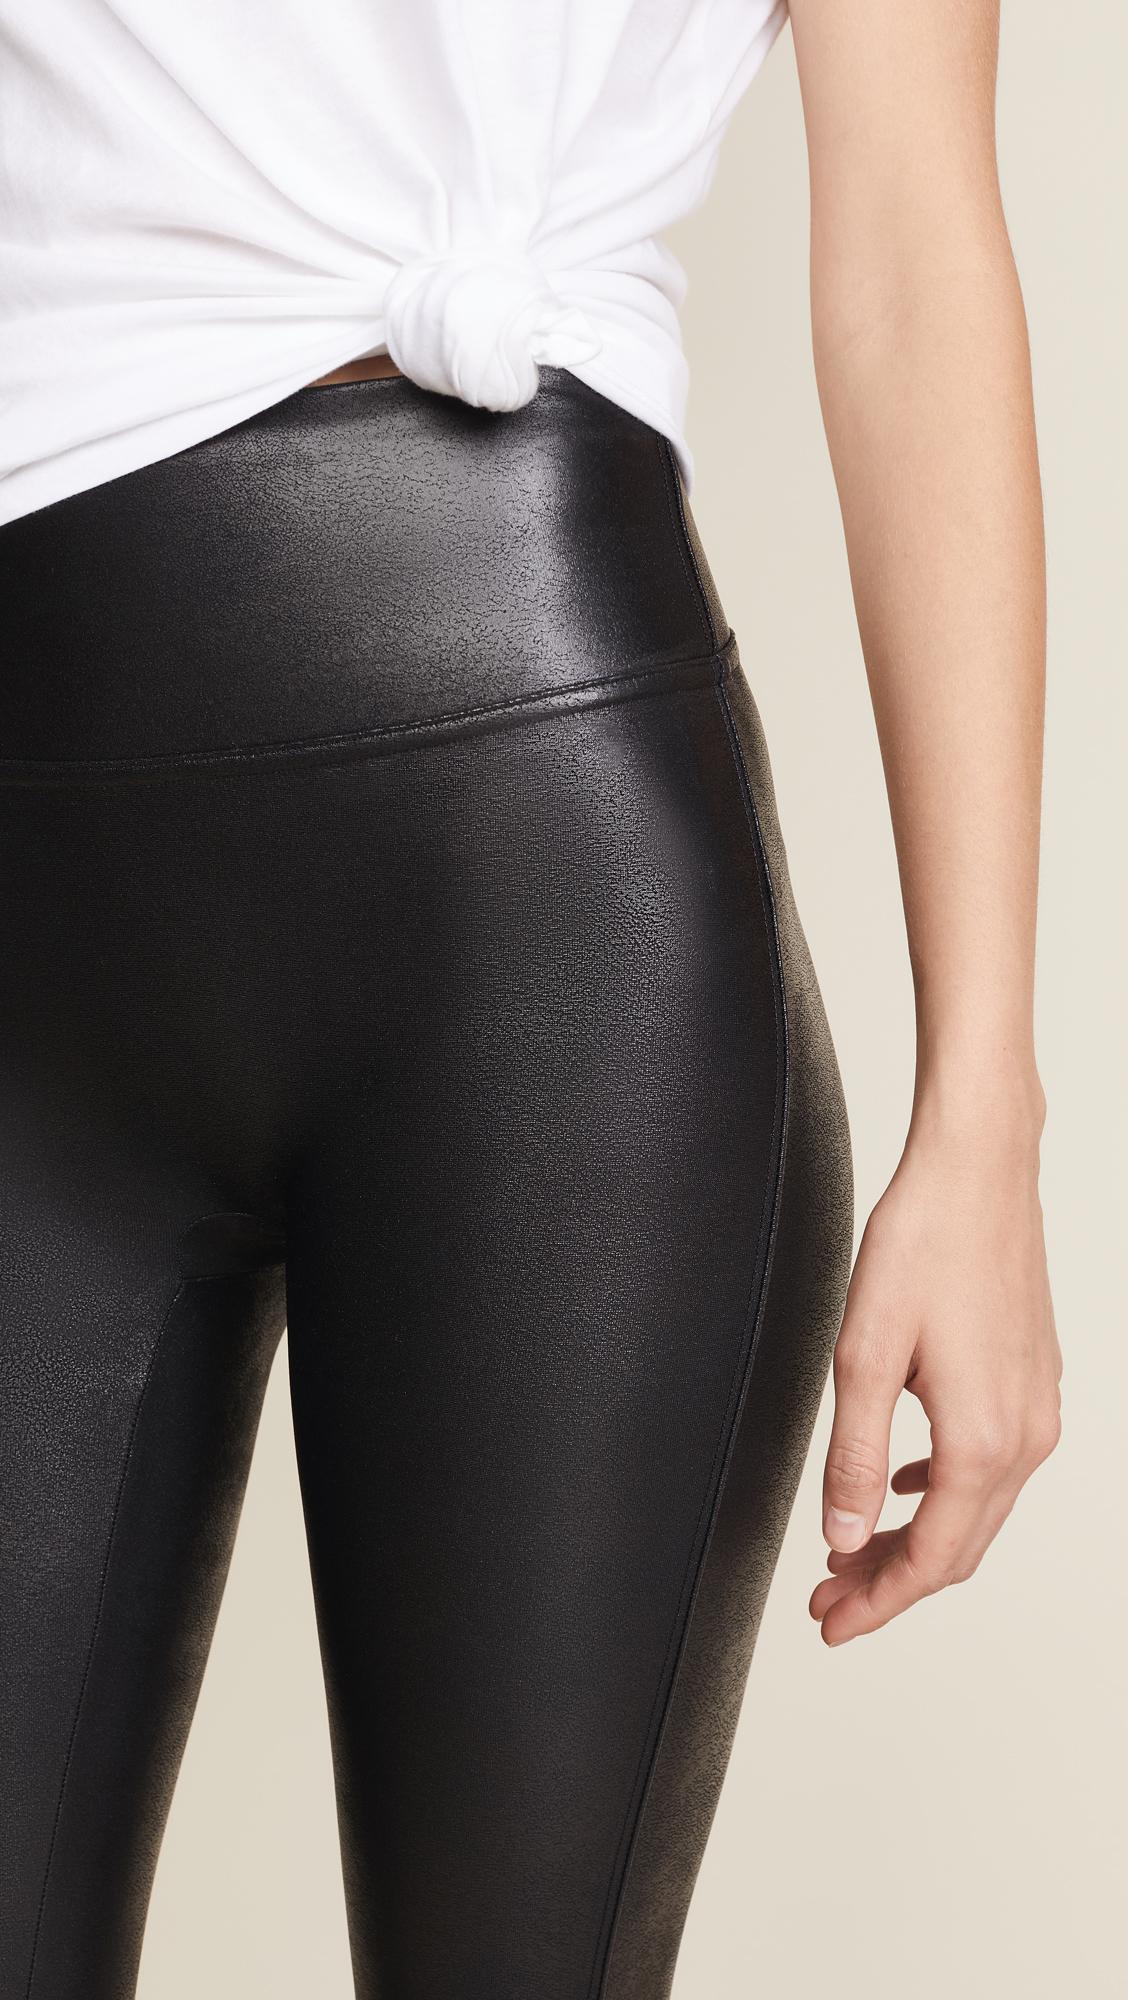 Spanx Petite Faux Leather Leggings Shopbop